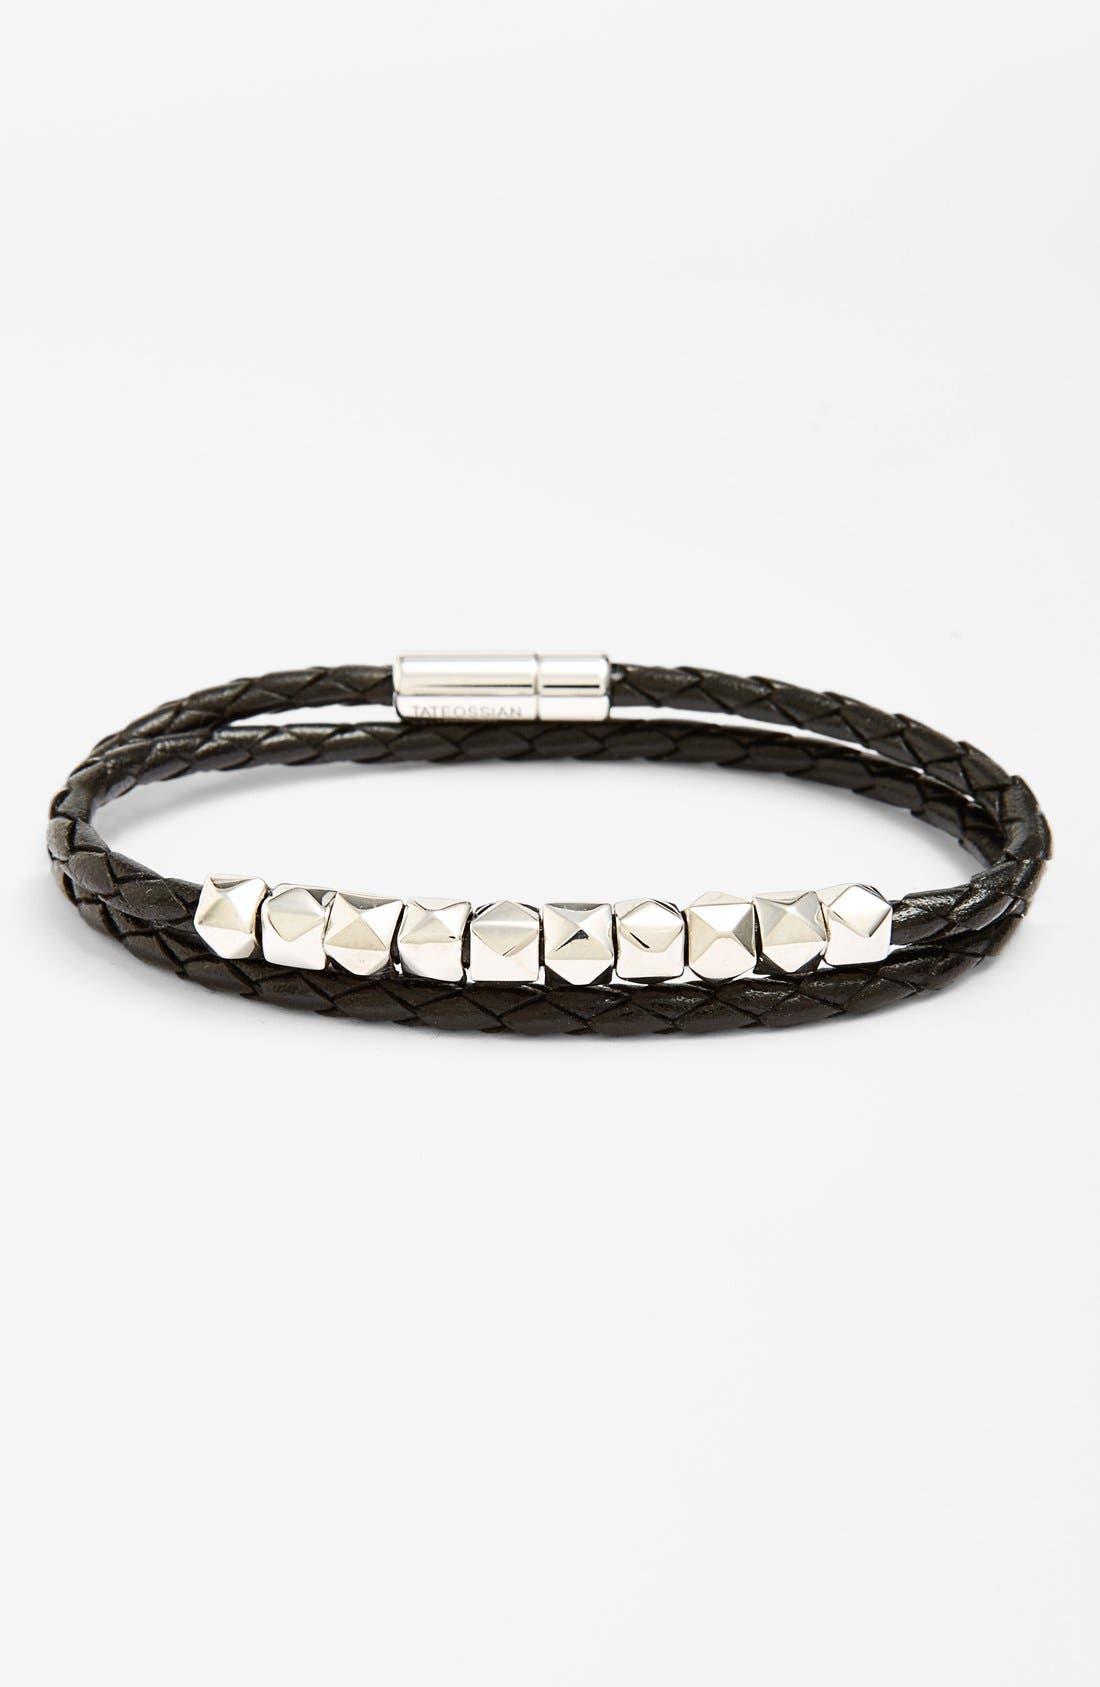 Main Image - Tateossian Studded Leather Wrap Bracelet